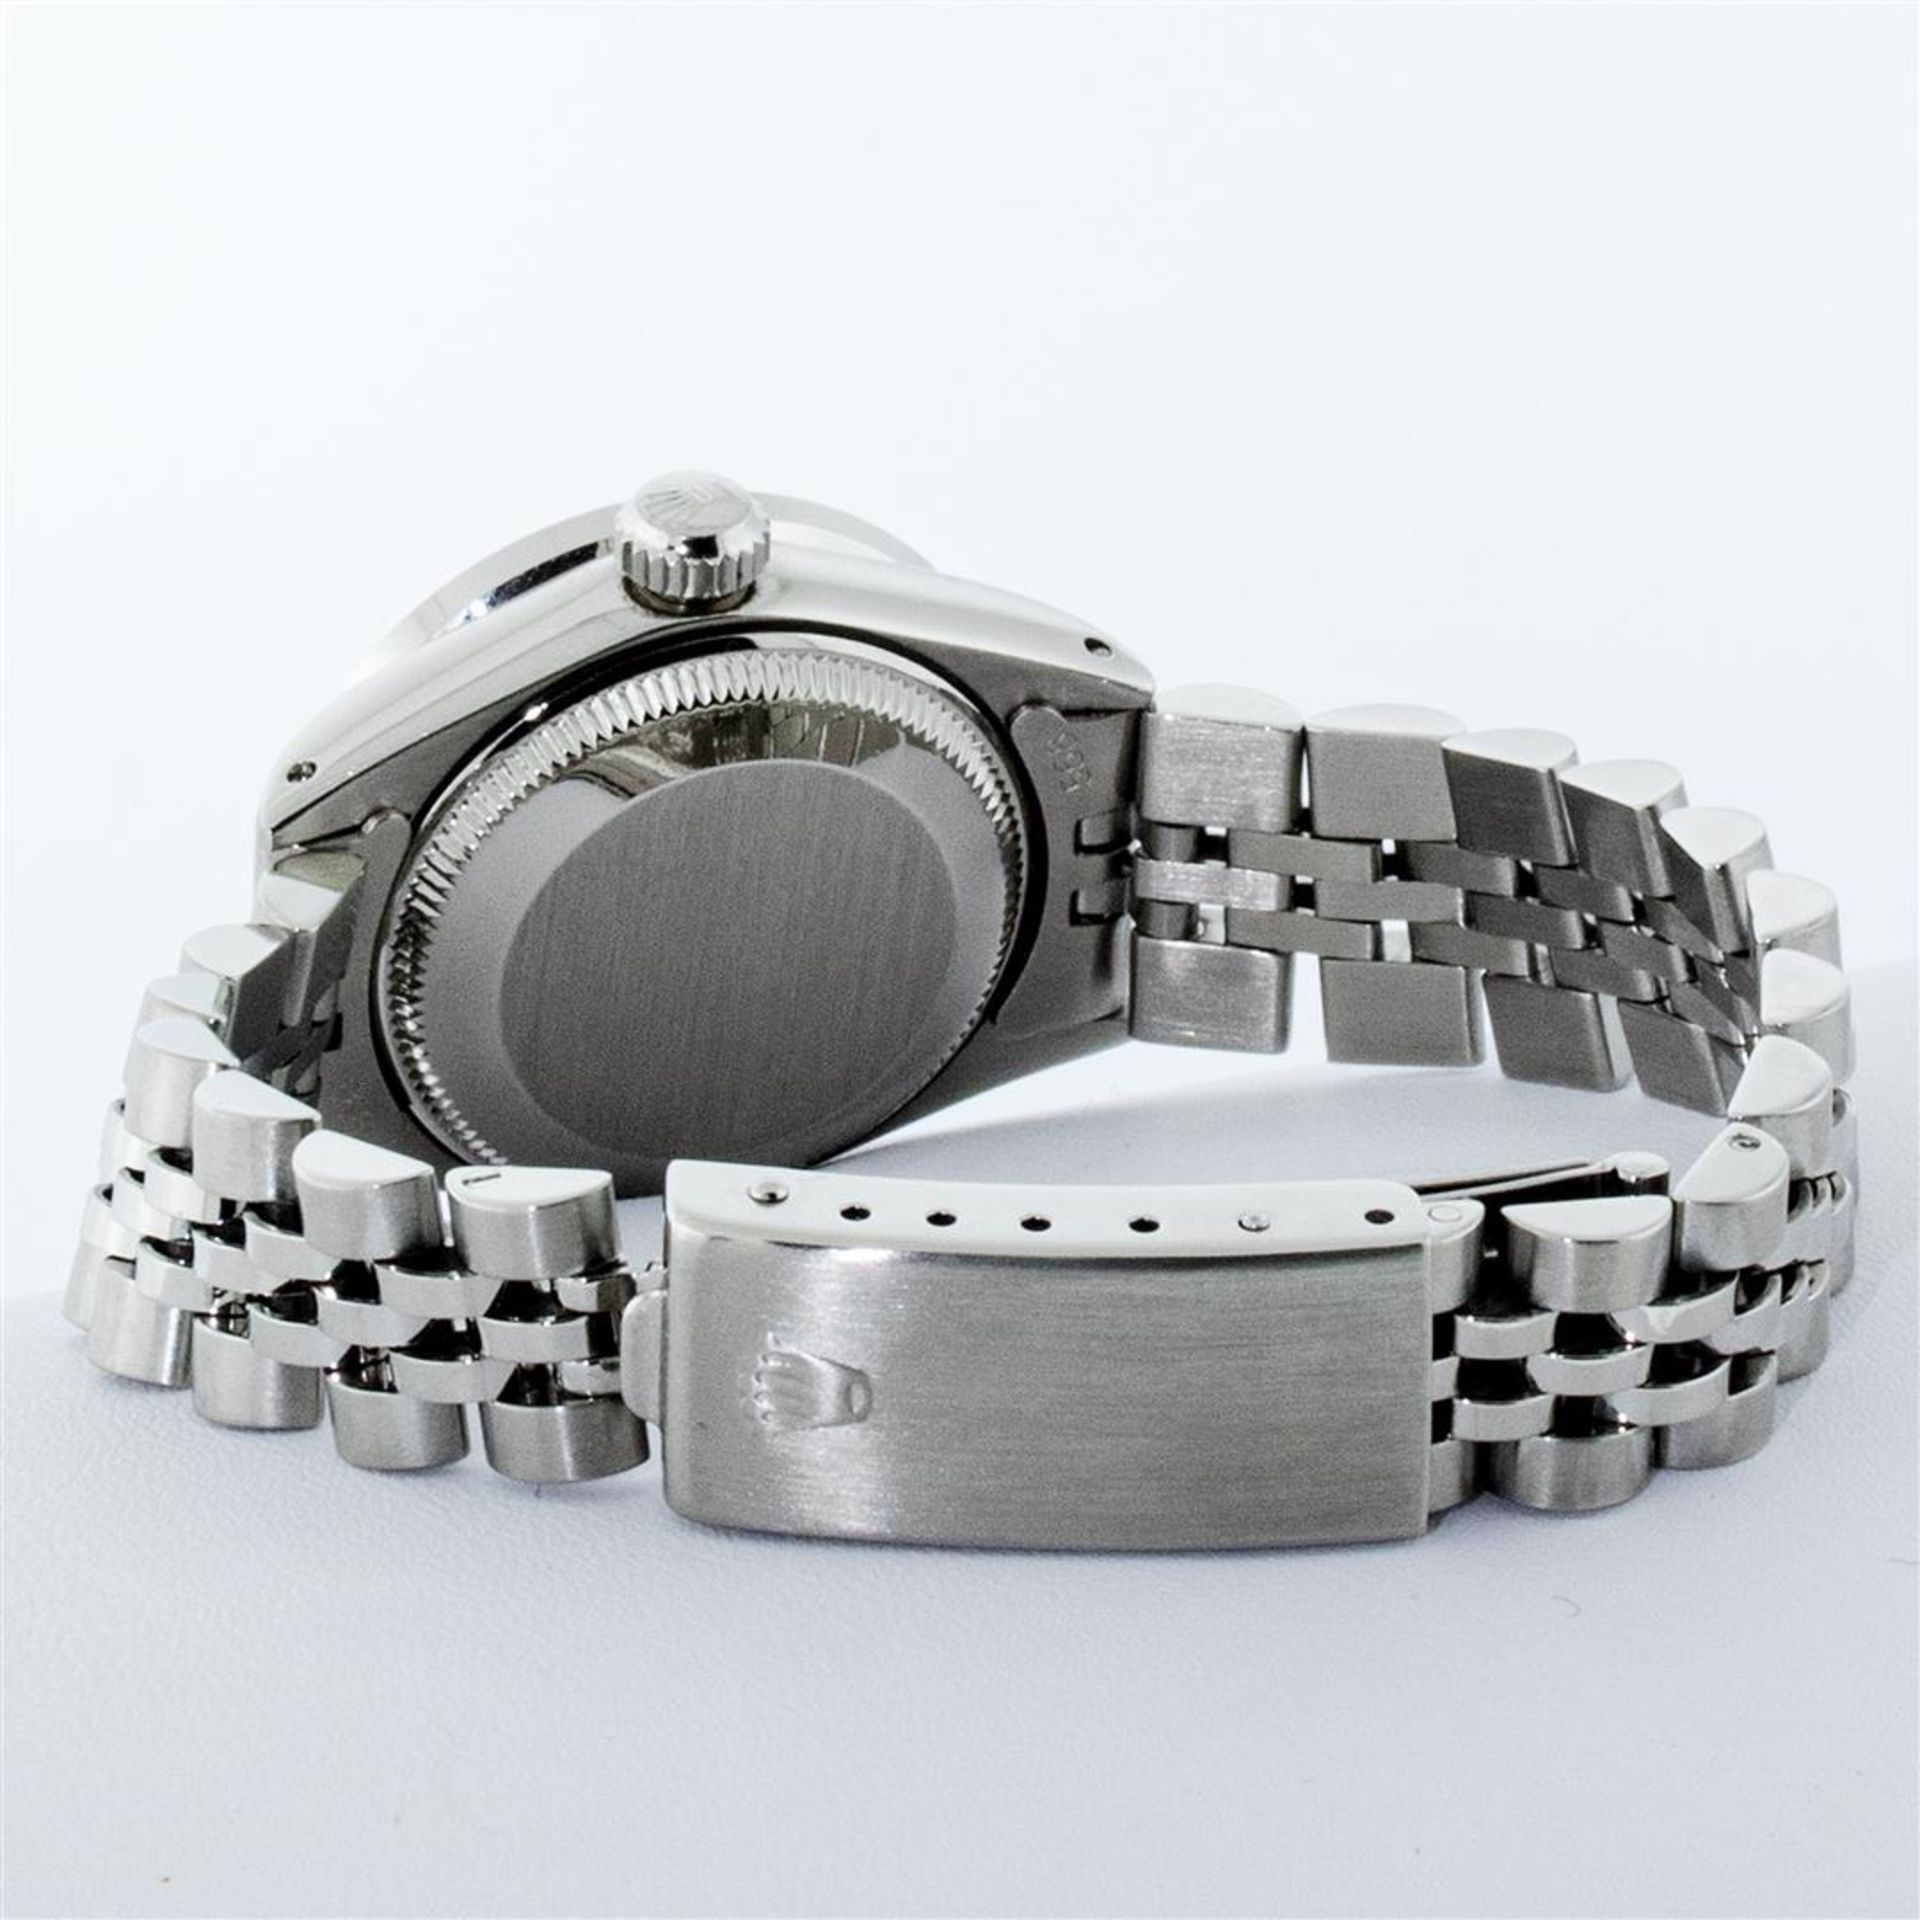 Rolex Ladies Stainless Steel Pink MOP Pyramid Diamond Datejust Wristwatch 26MM - Image 9 of 9